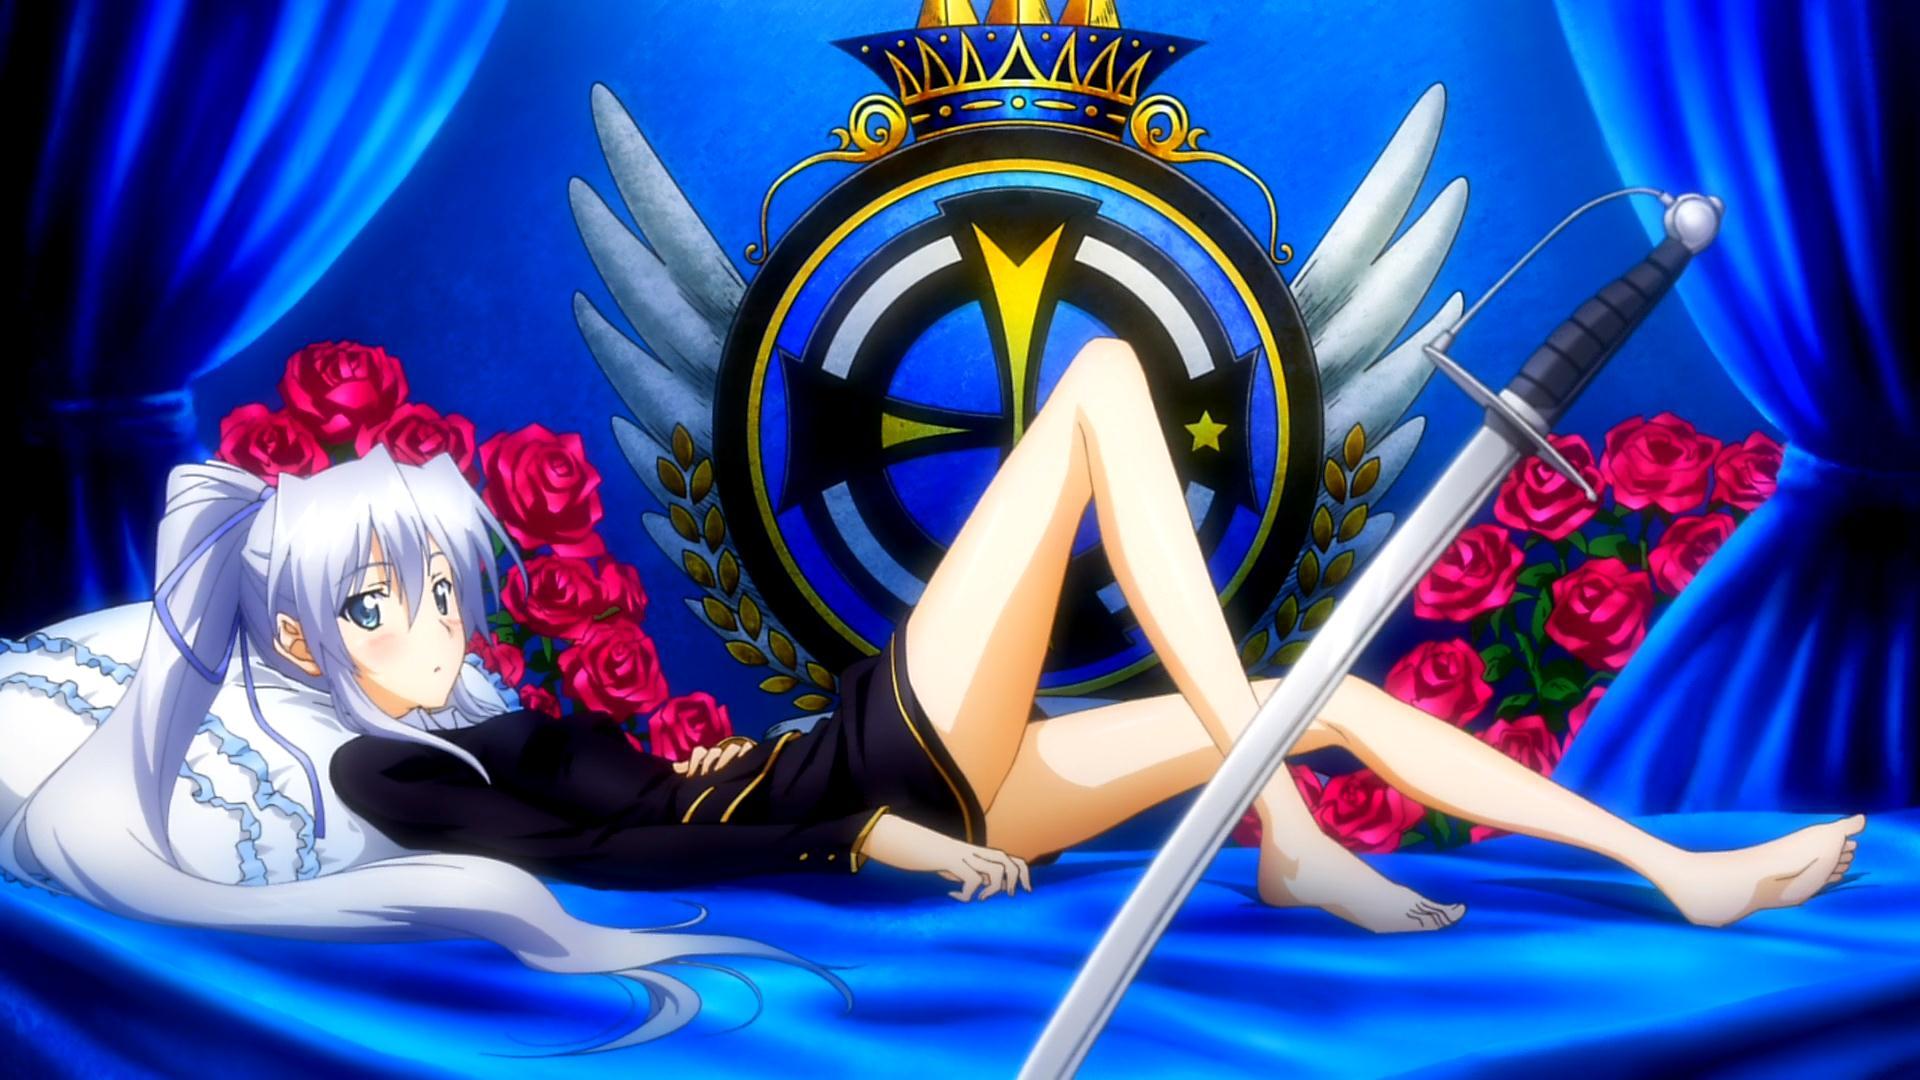 Campione! Pics, Anime Collection